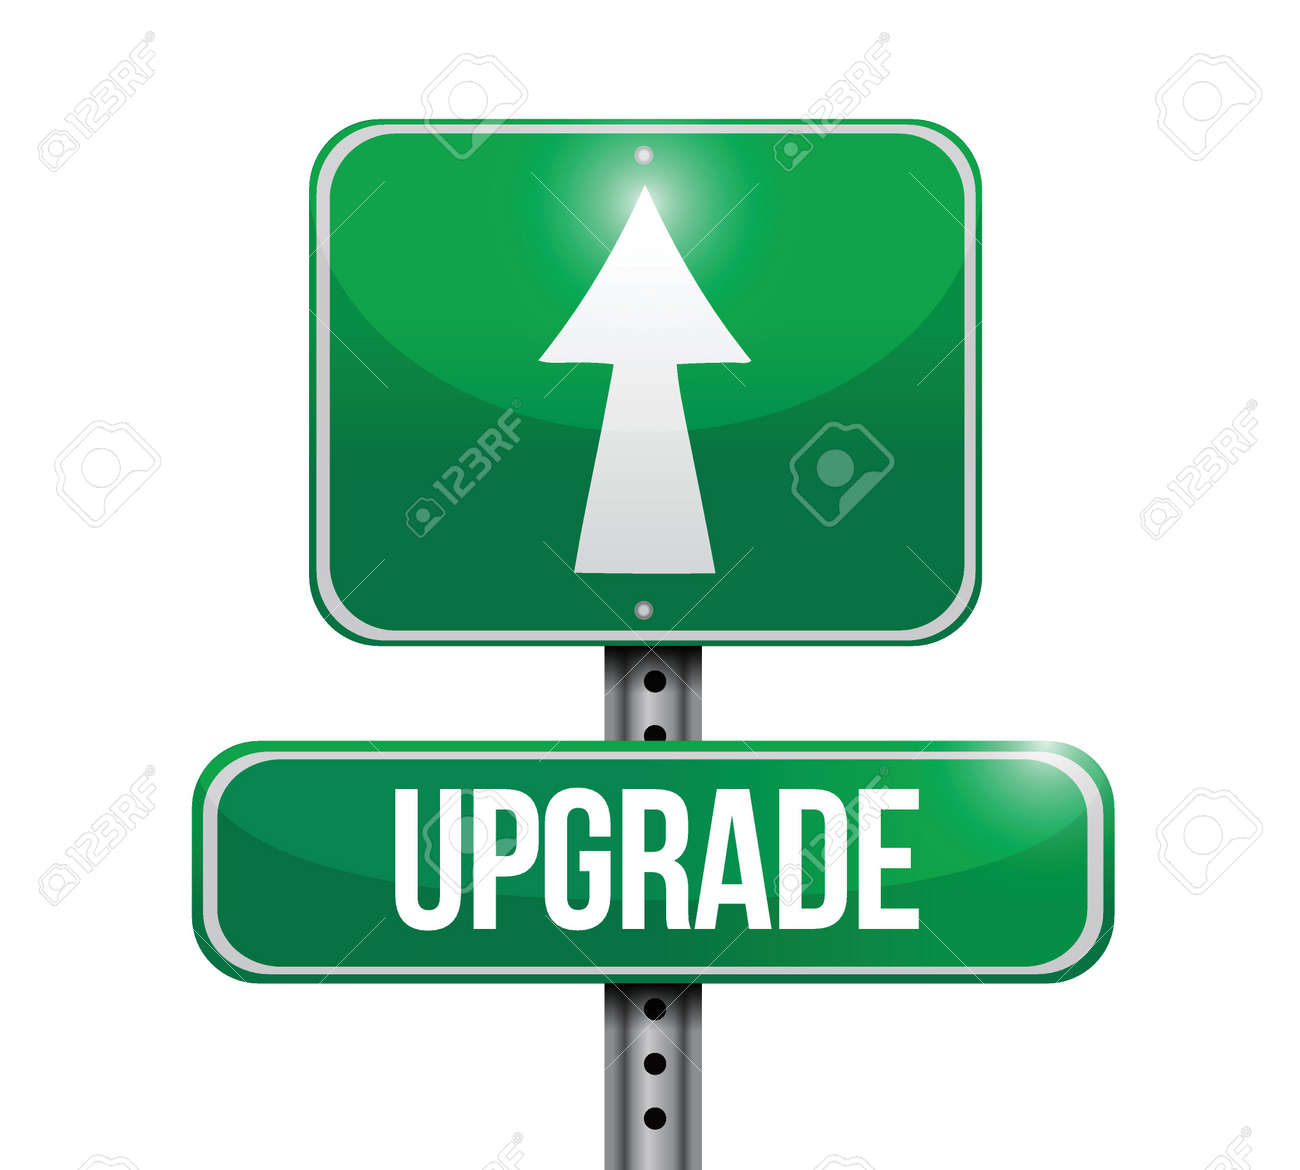 upgrade road sign illustration design over a white background Stock Vector - 23964342